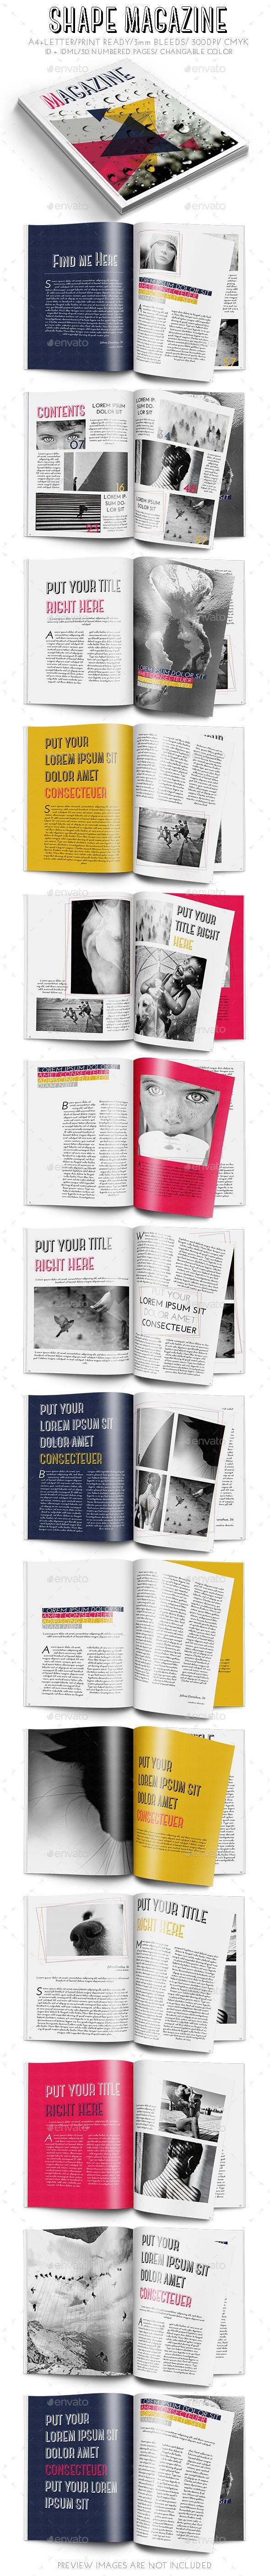 Shape Magazine - Magazines Print Templates